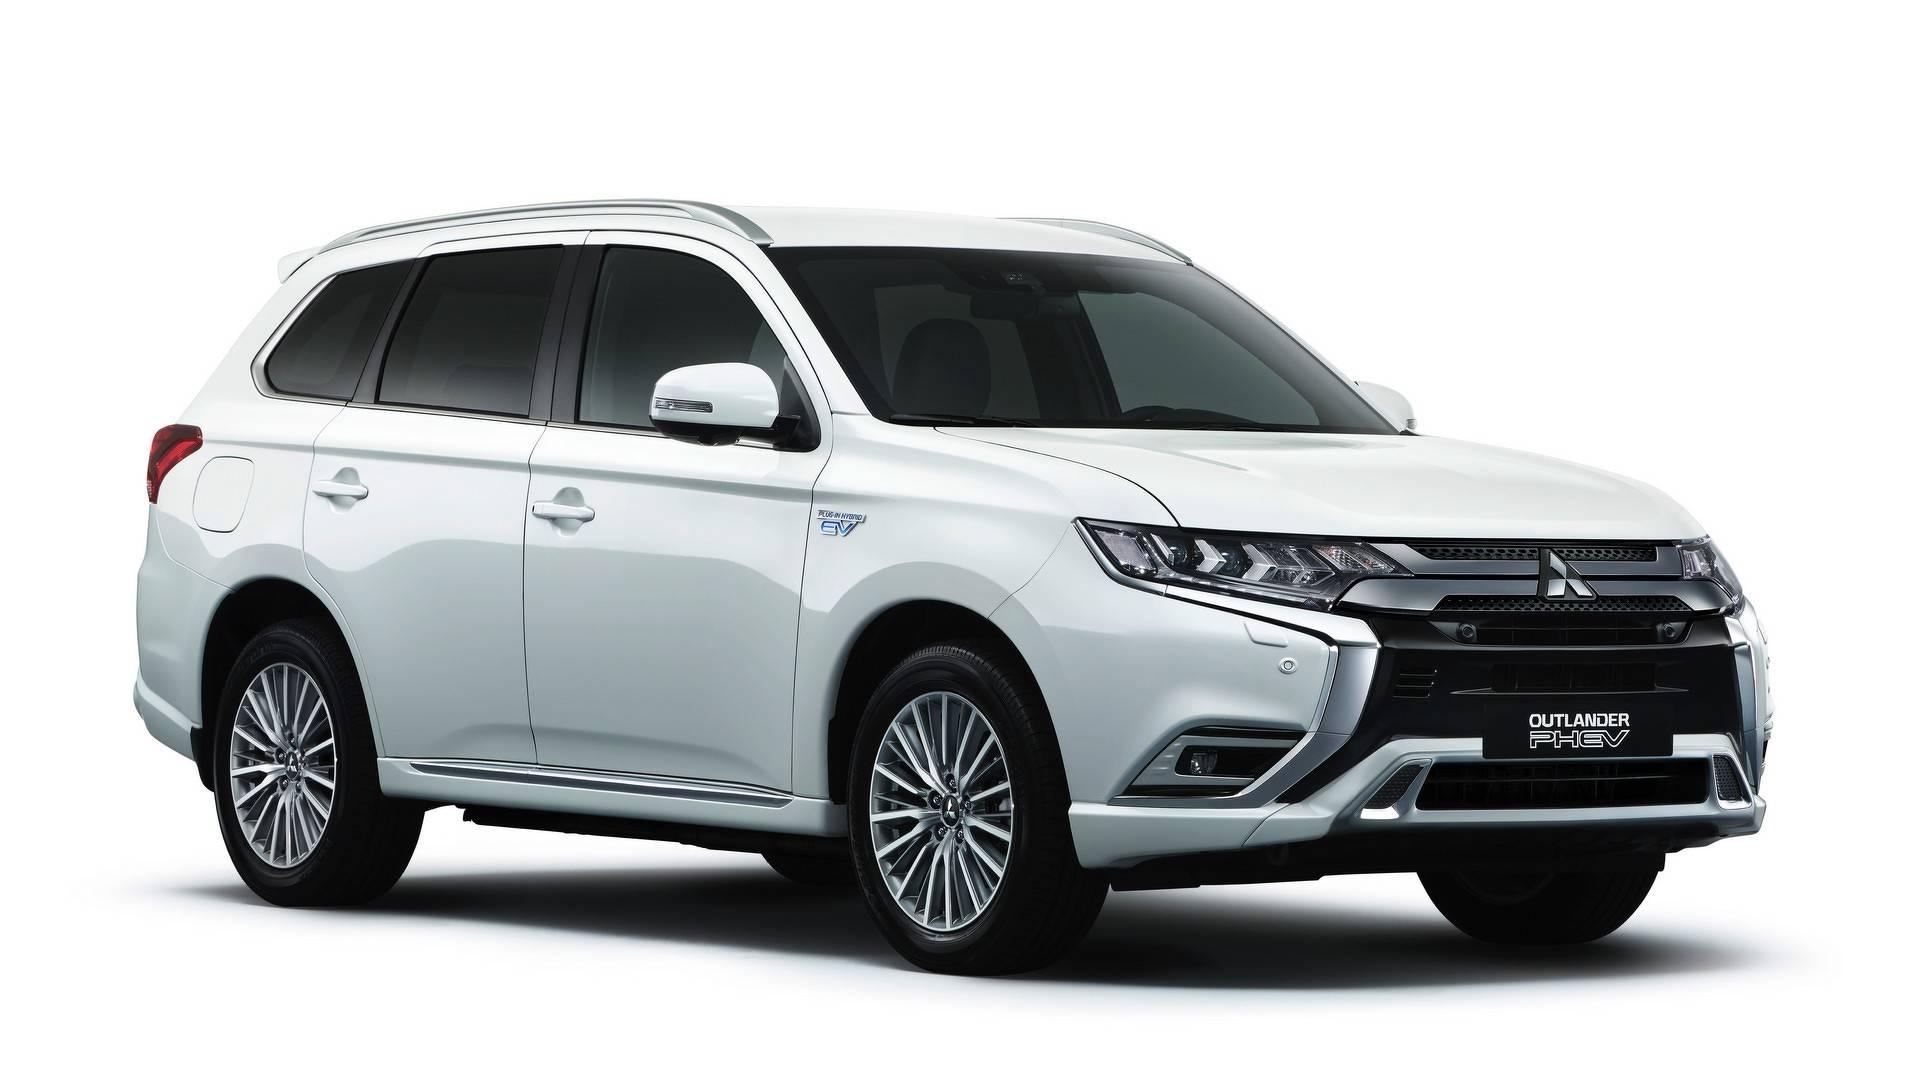 2019 Mitsubishi Outlander PHEV WLTP Rated 45 Kilometers Of